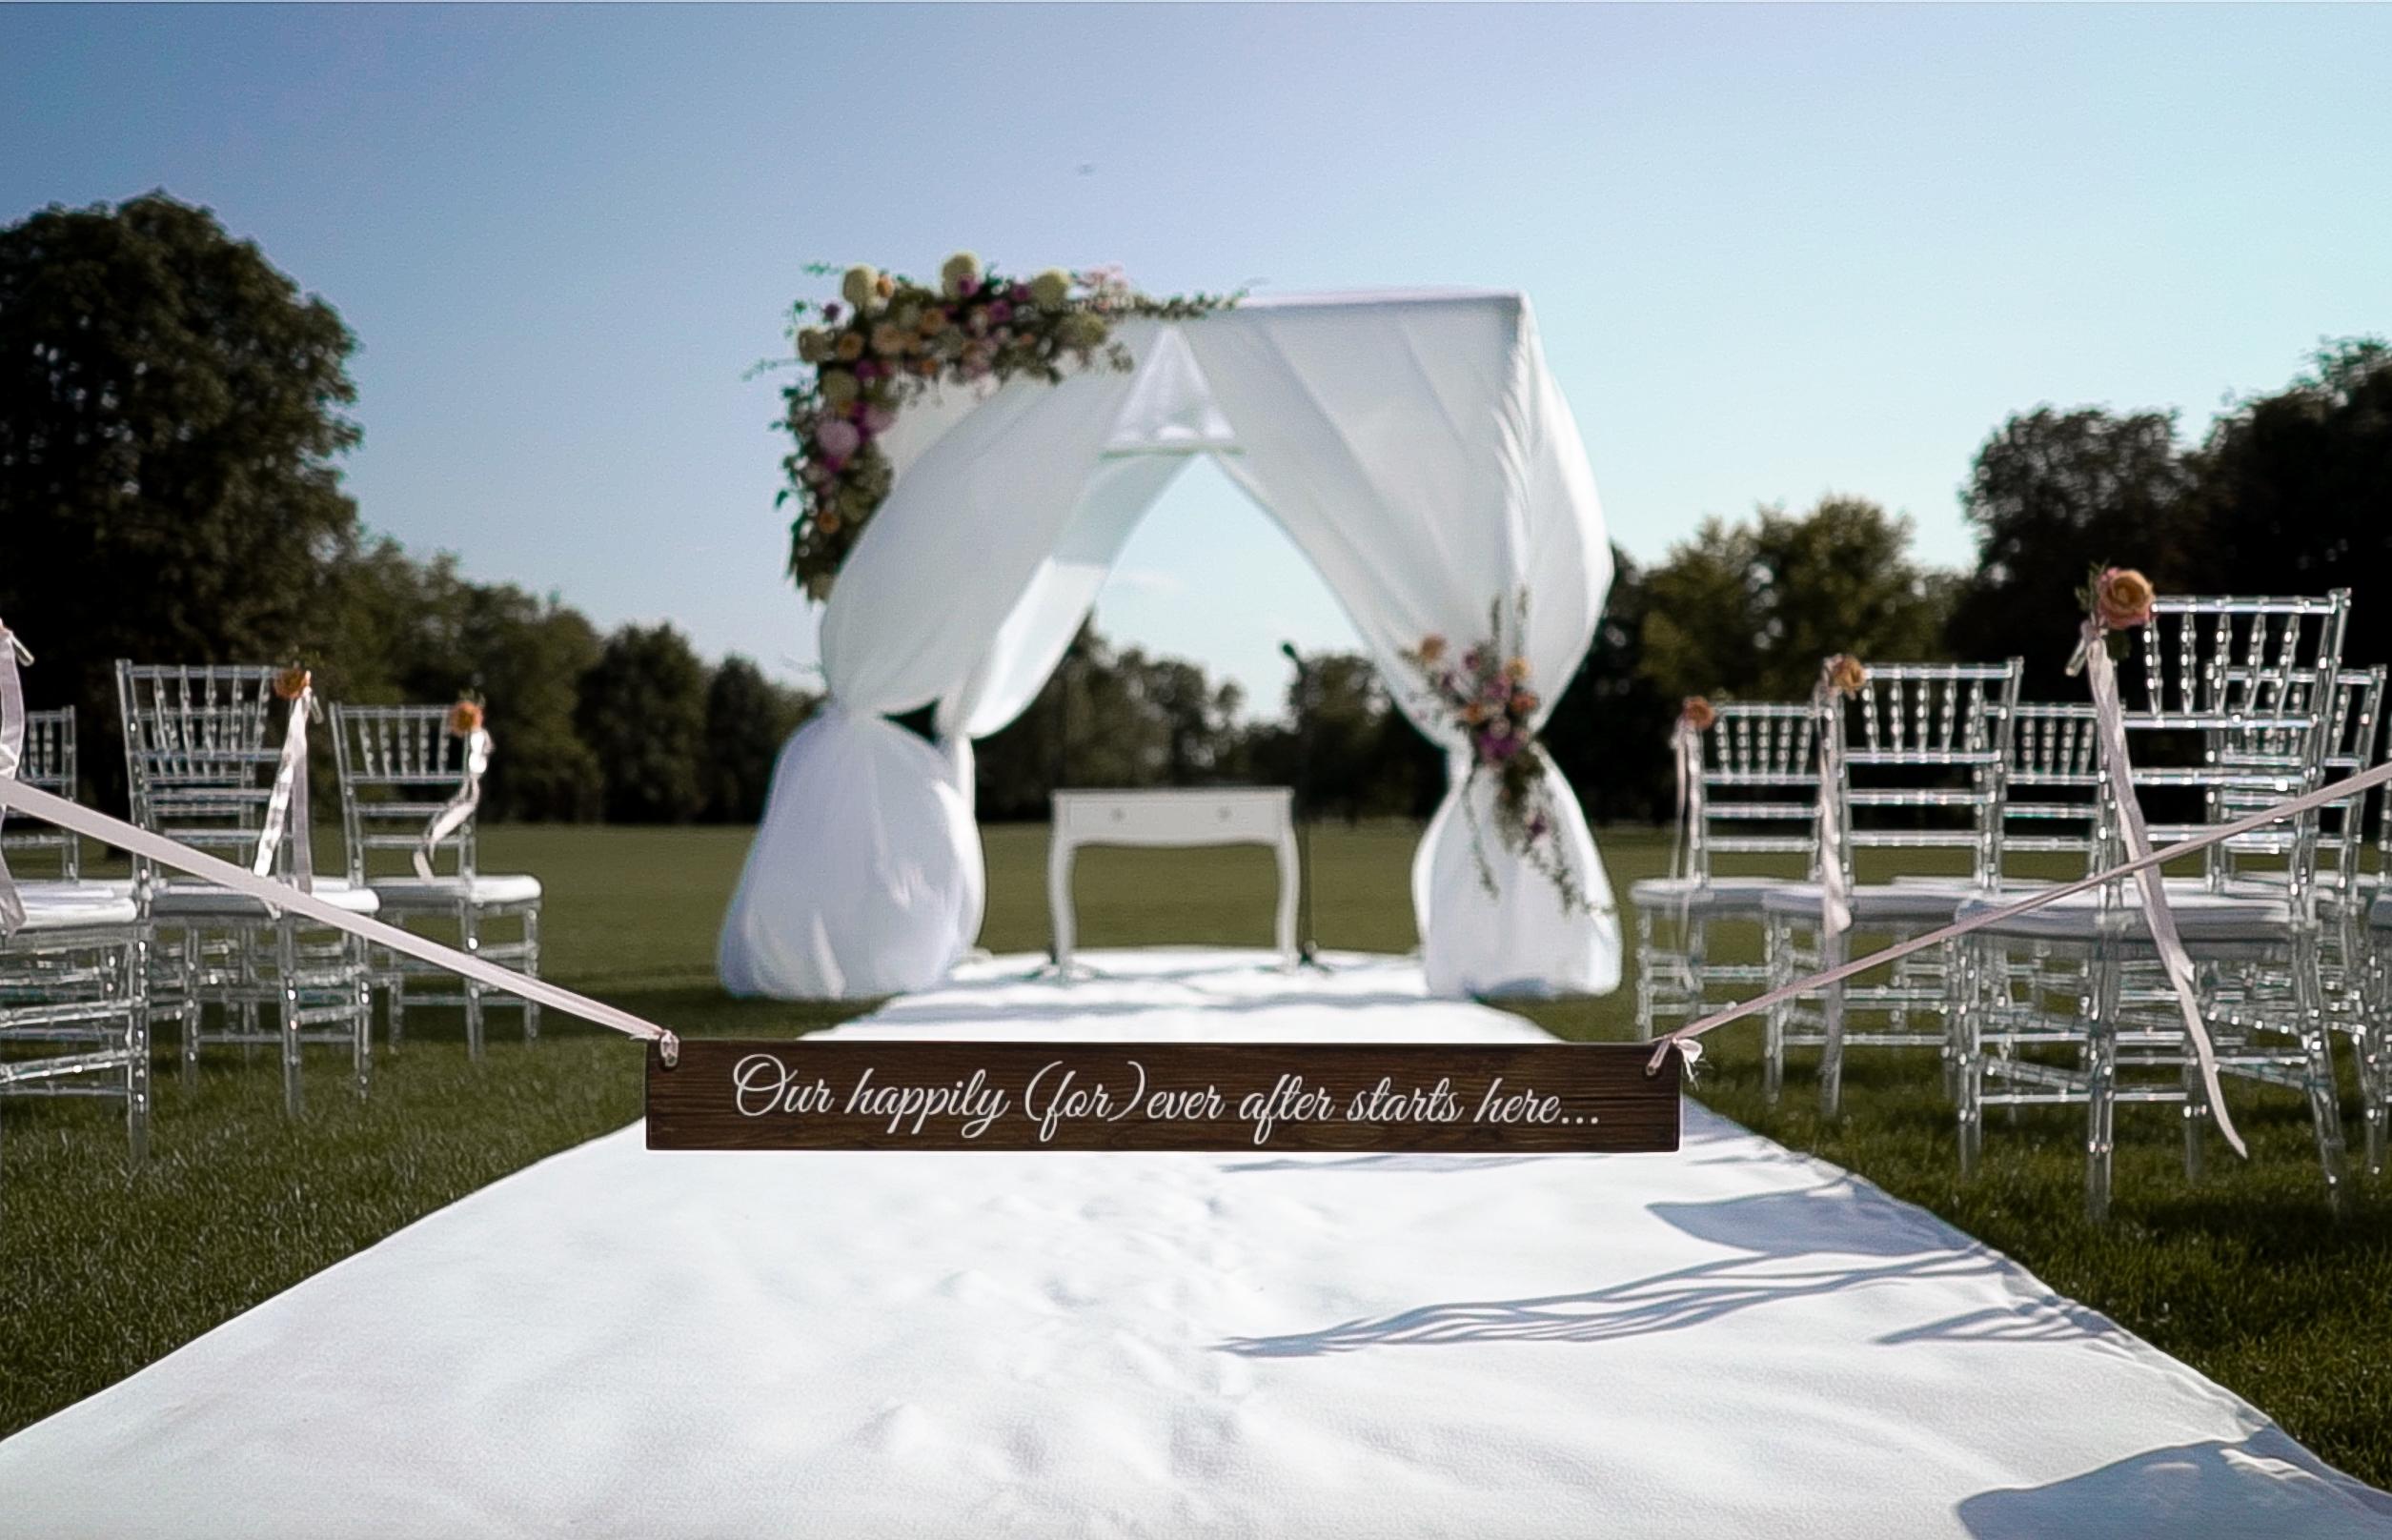 obrad-svadba-v-tomasove